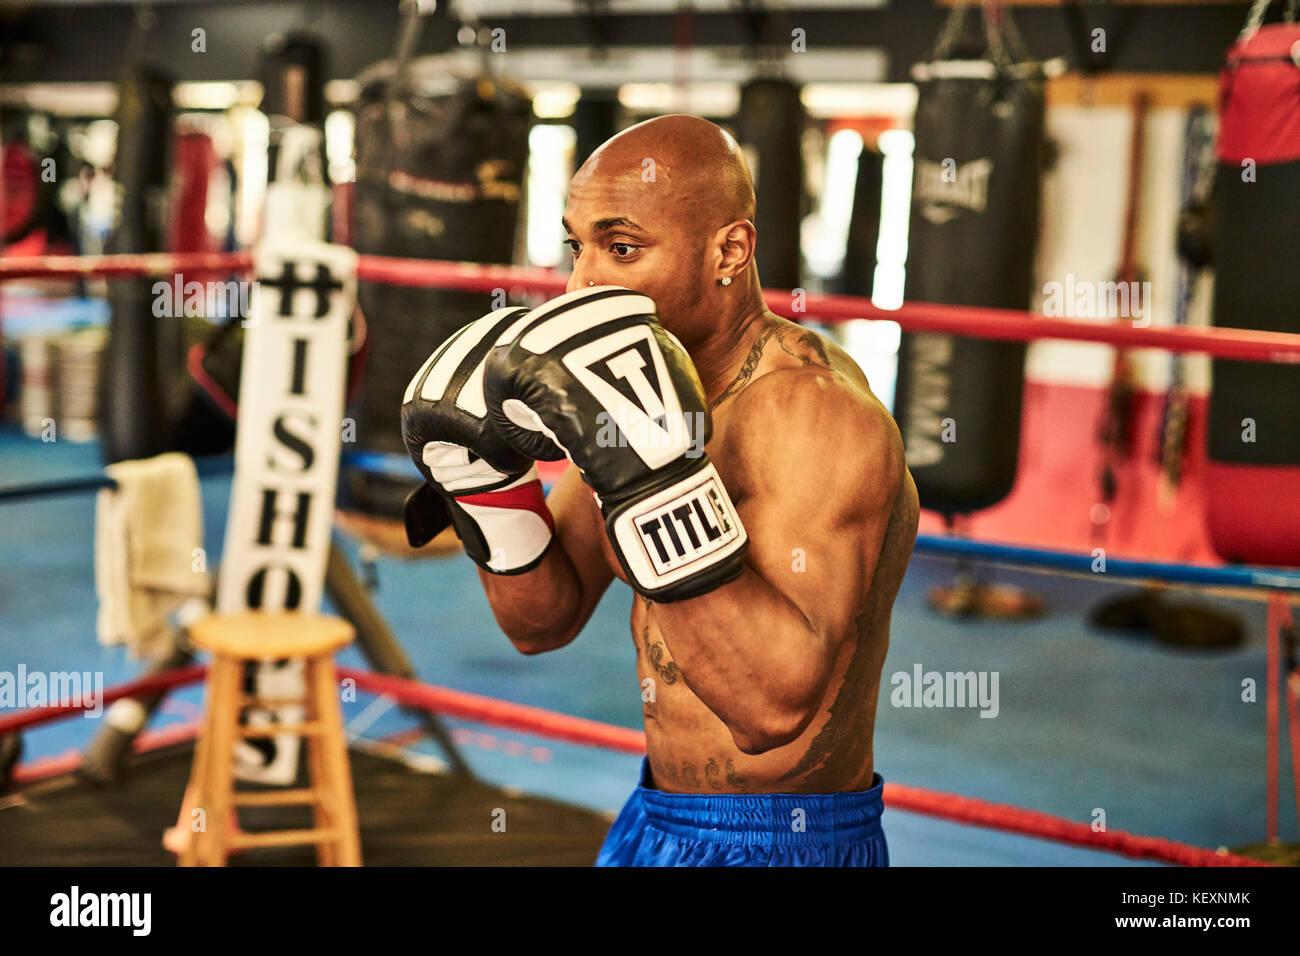 Male boxer training alone inside boxing ring, Taunton, Massachusetts, USA - Stock Image